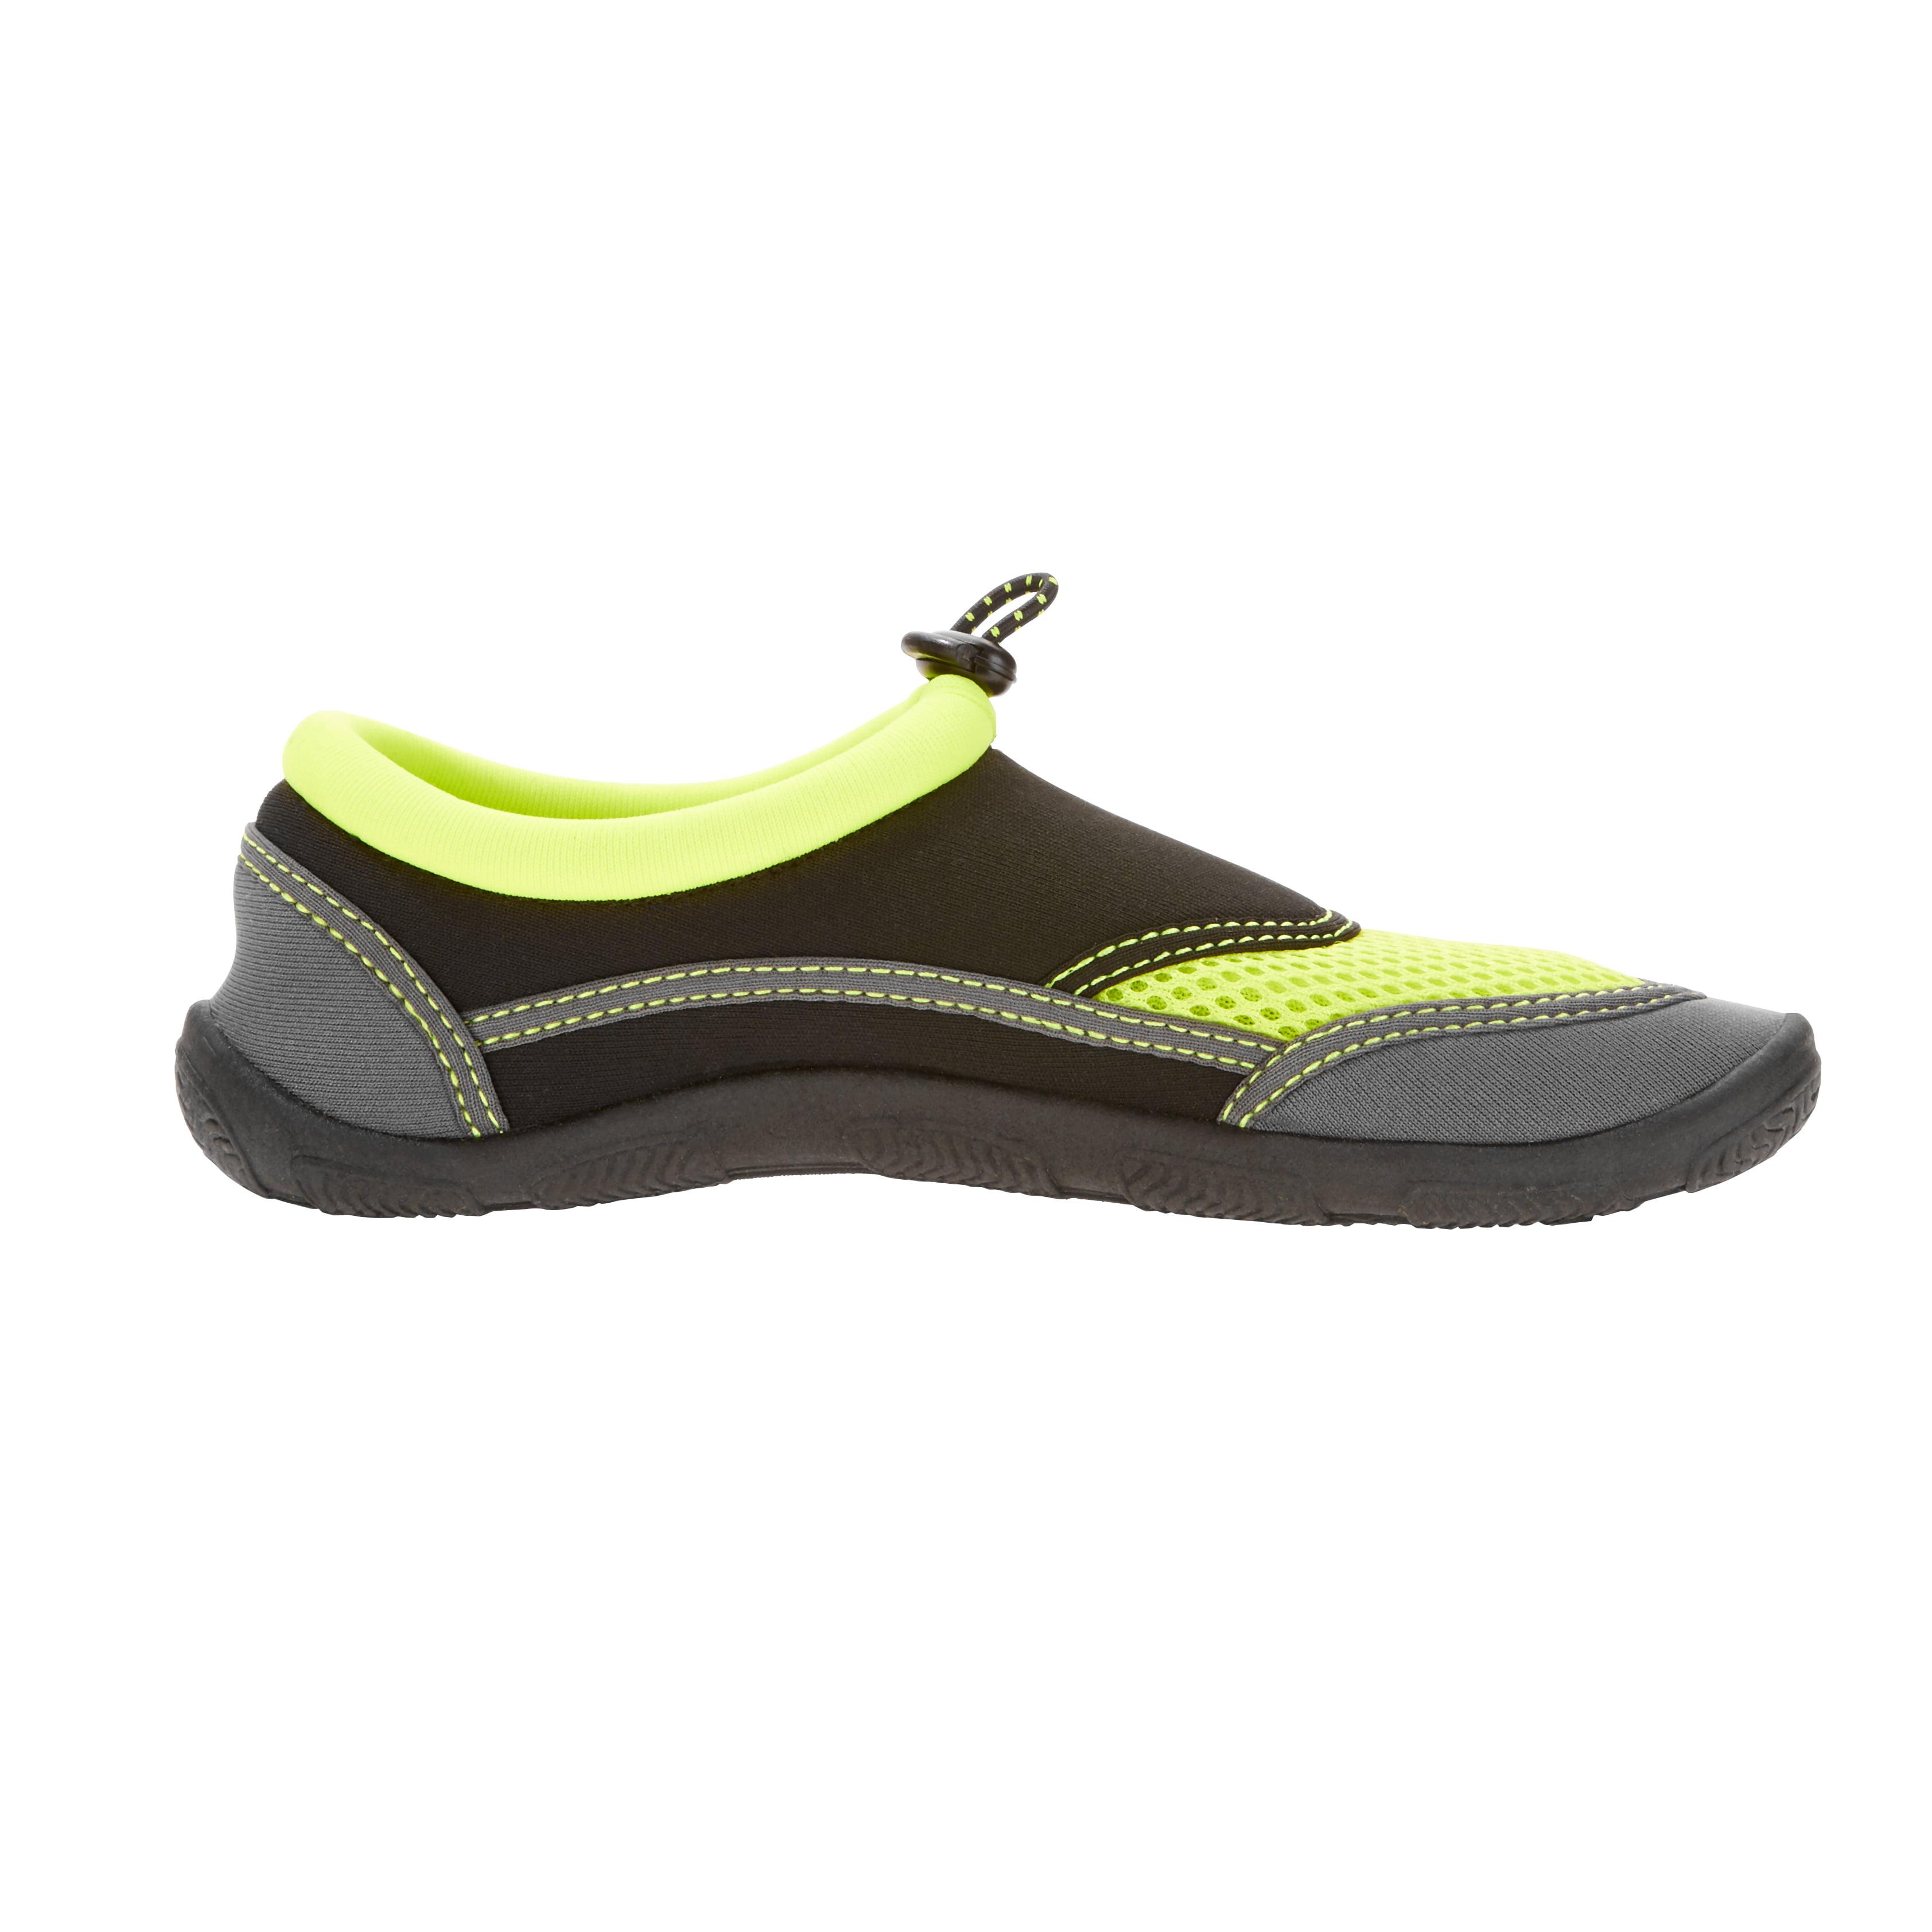 Boys' Beach Water Shoe - Walmart